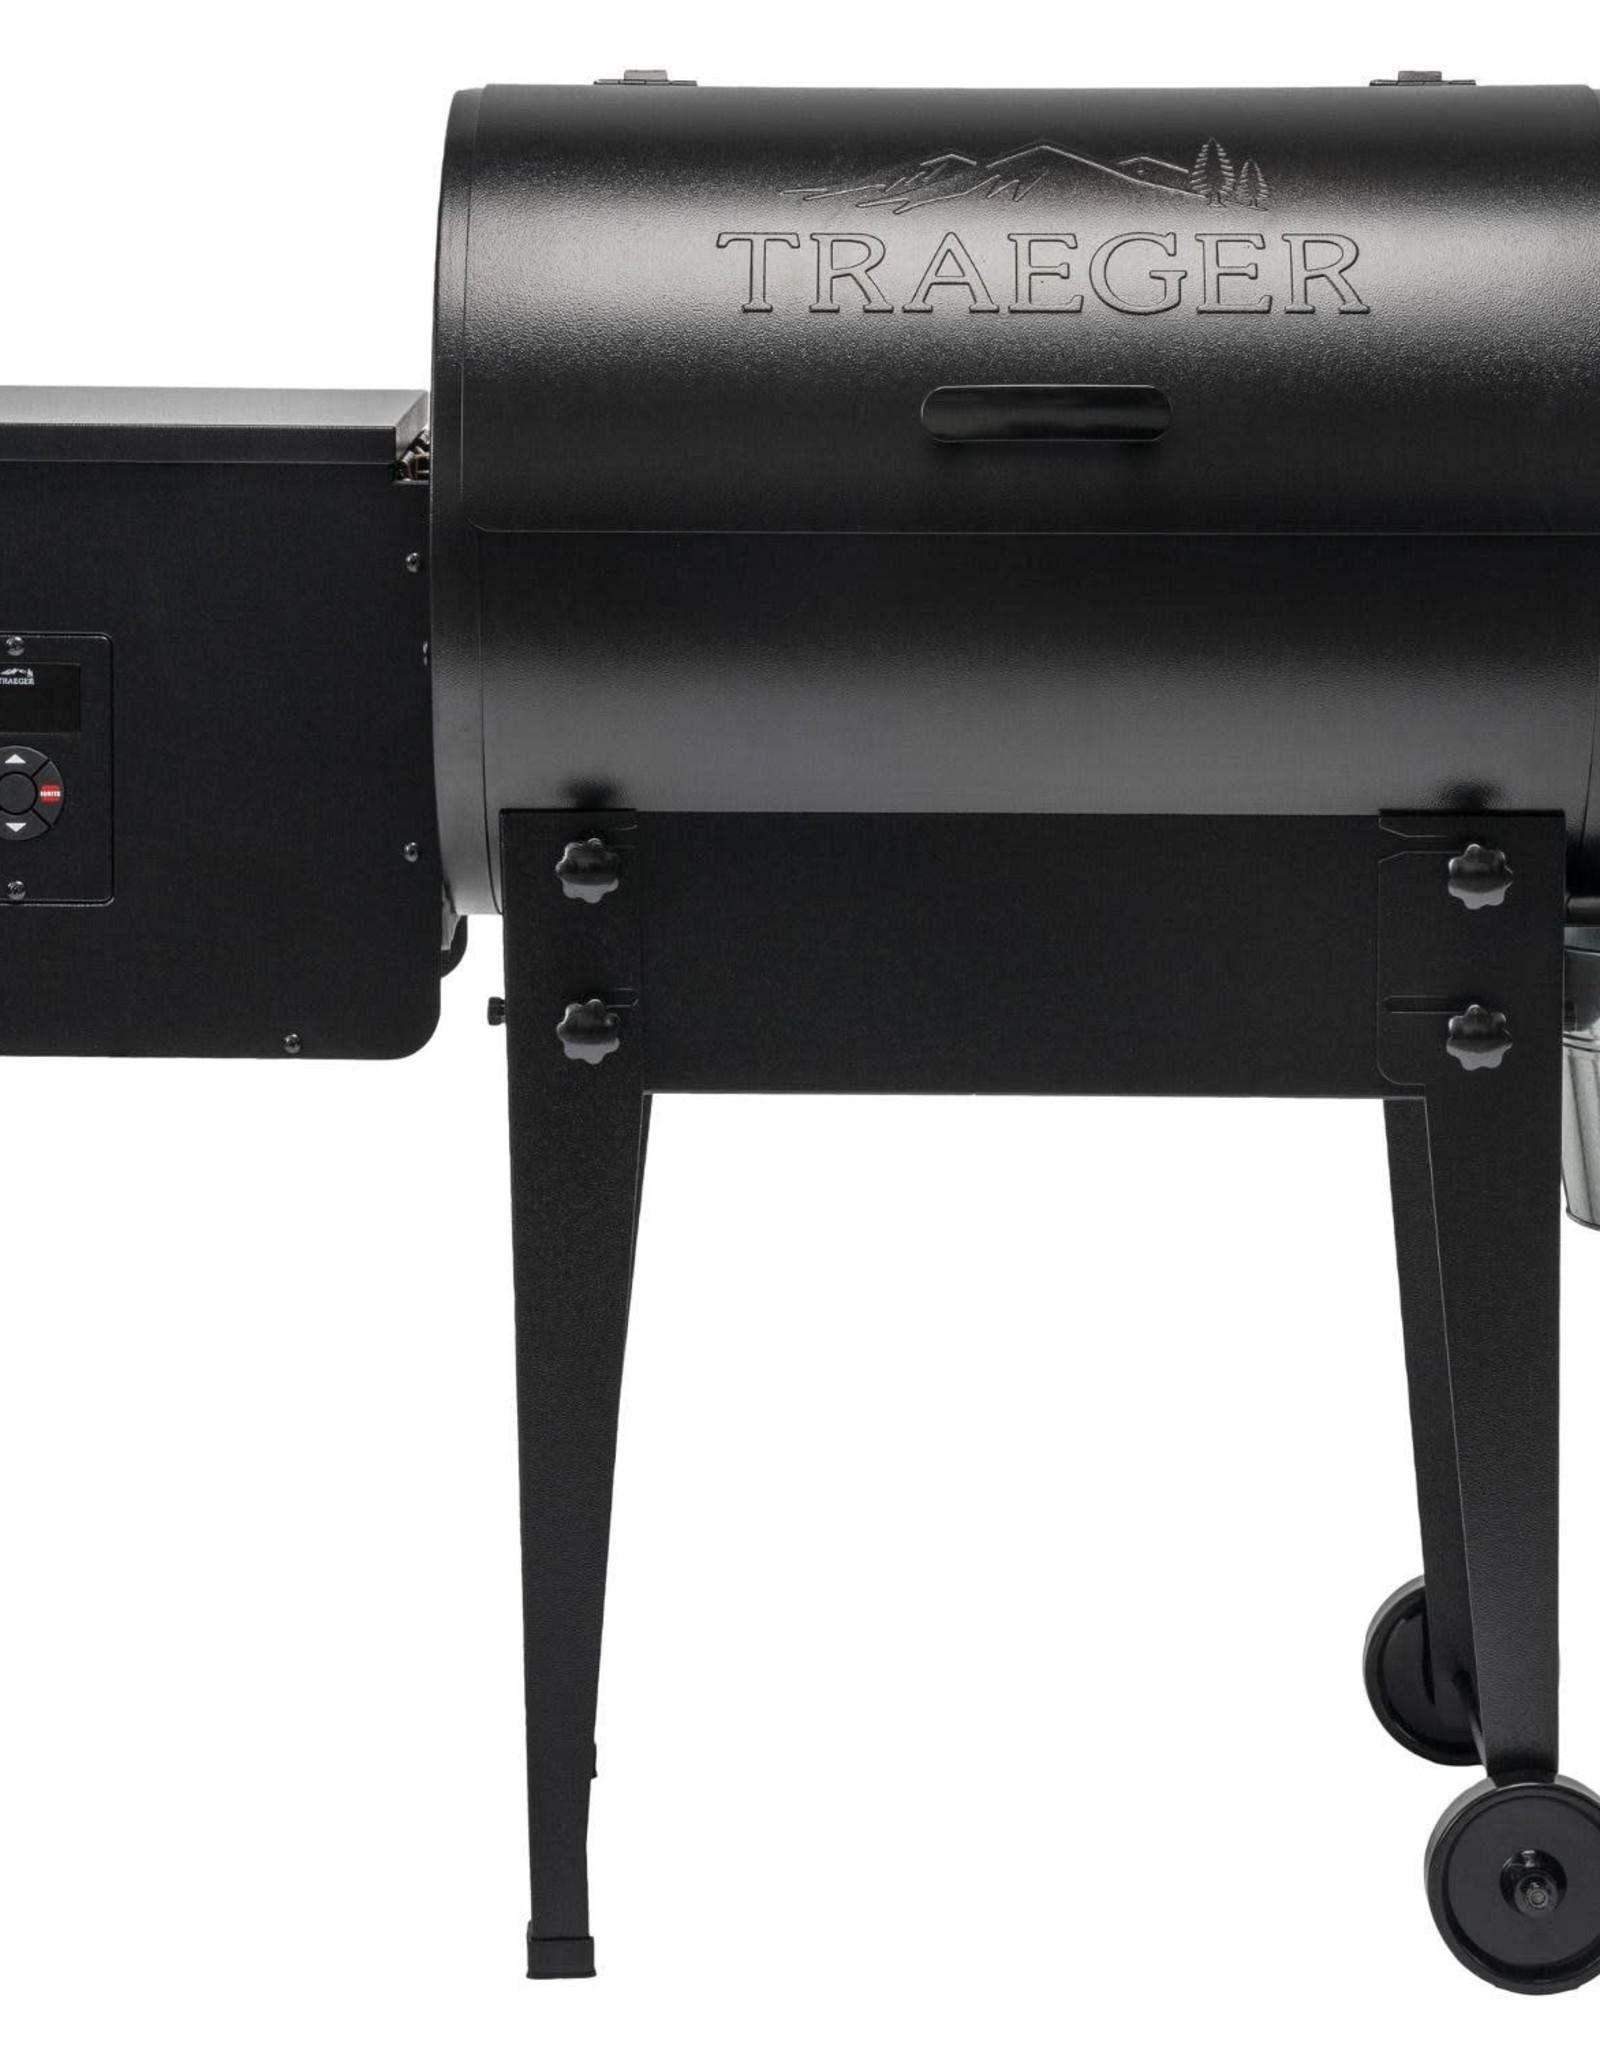 Traeger Traeger Tailgater 20 Portable Wood Pellet Grill - Black - TFB30KL